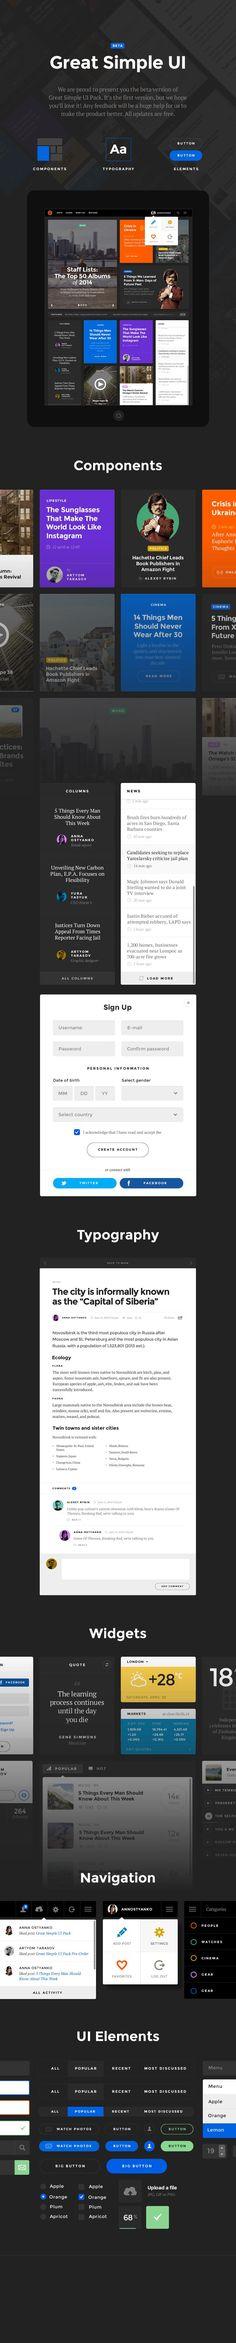 Création #Site #Mobile, #Template pour #Mobile